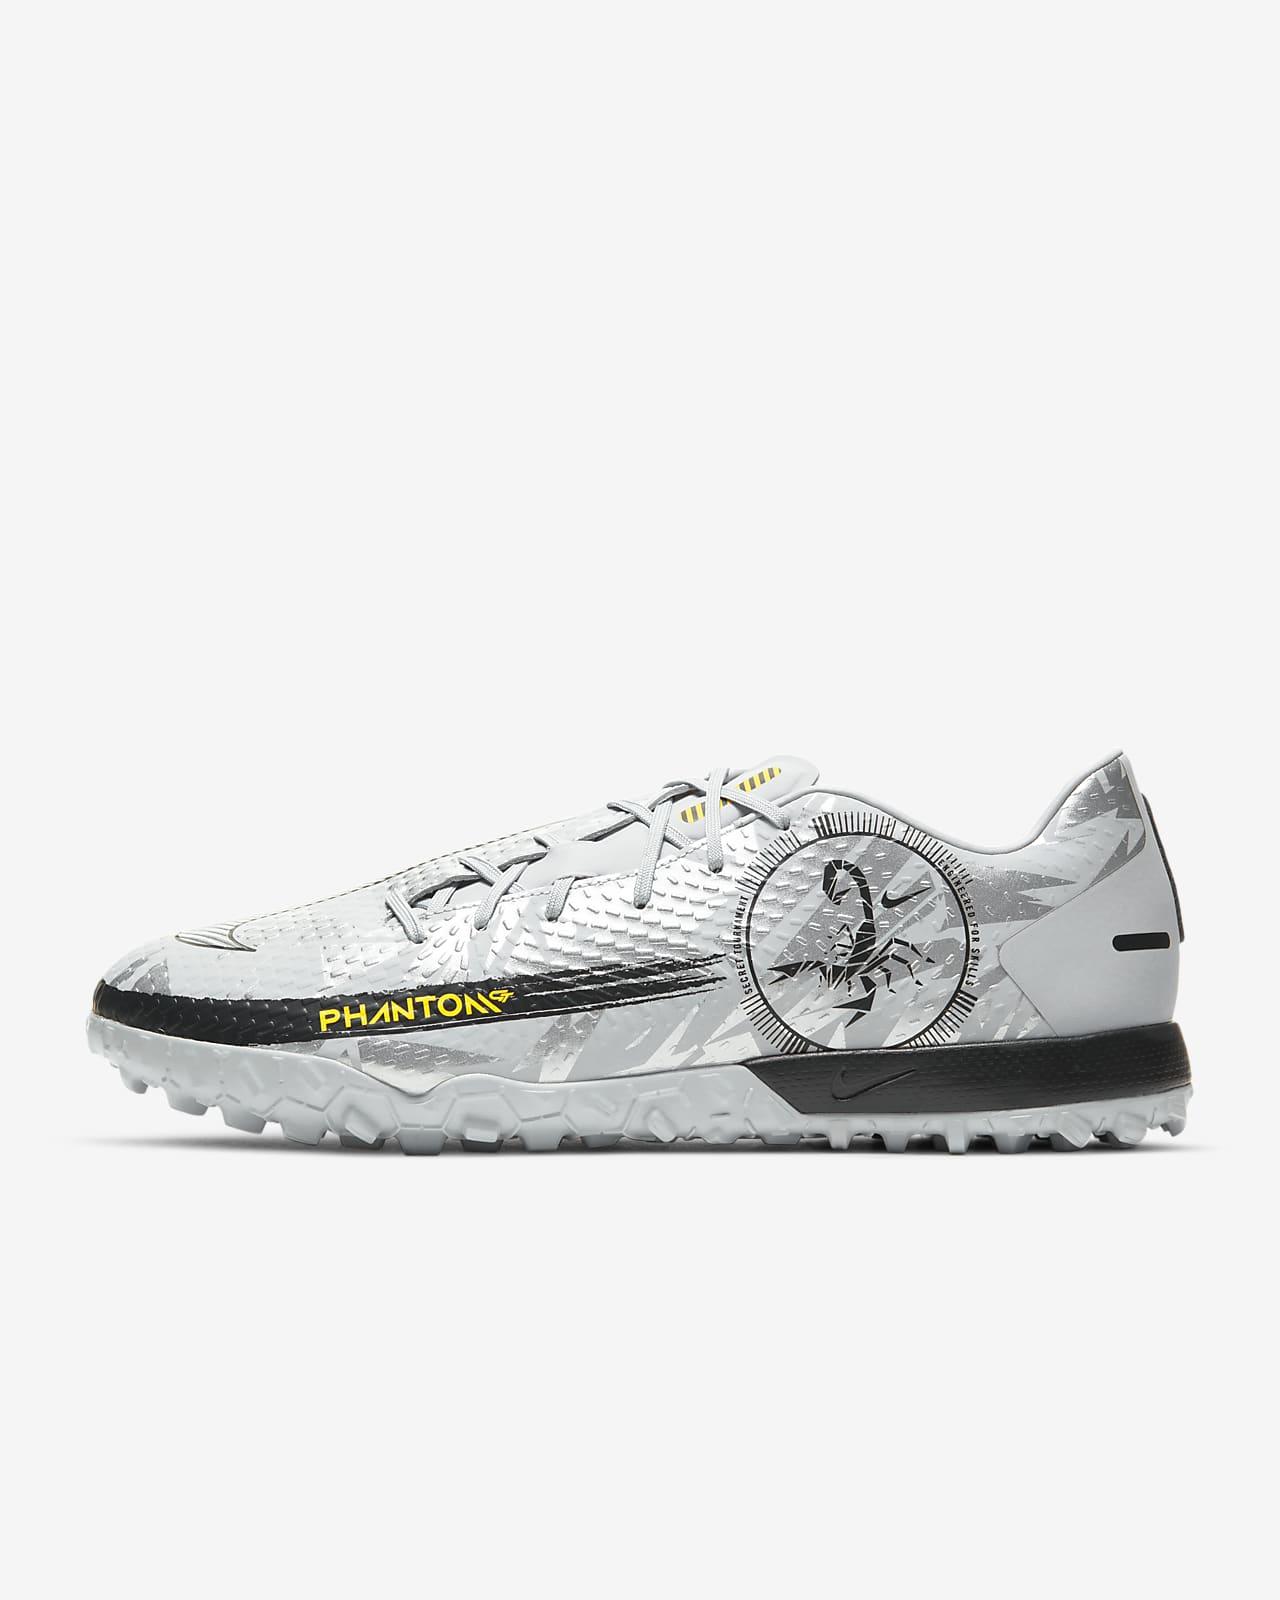 Nike Phantom Scorpion Academy Dynamic Fit TF Artificial-Turf Football Shoe